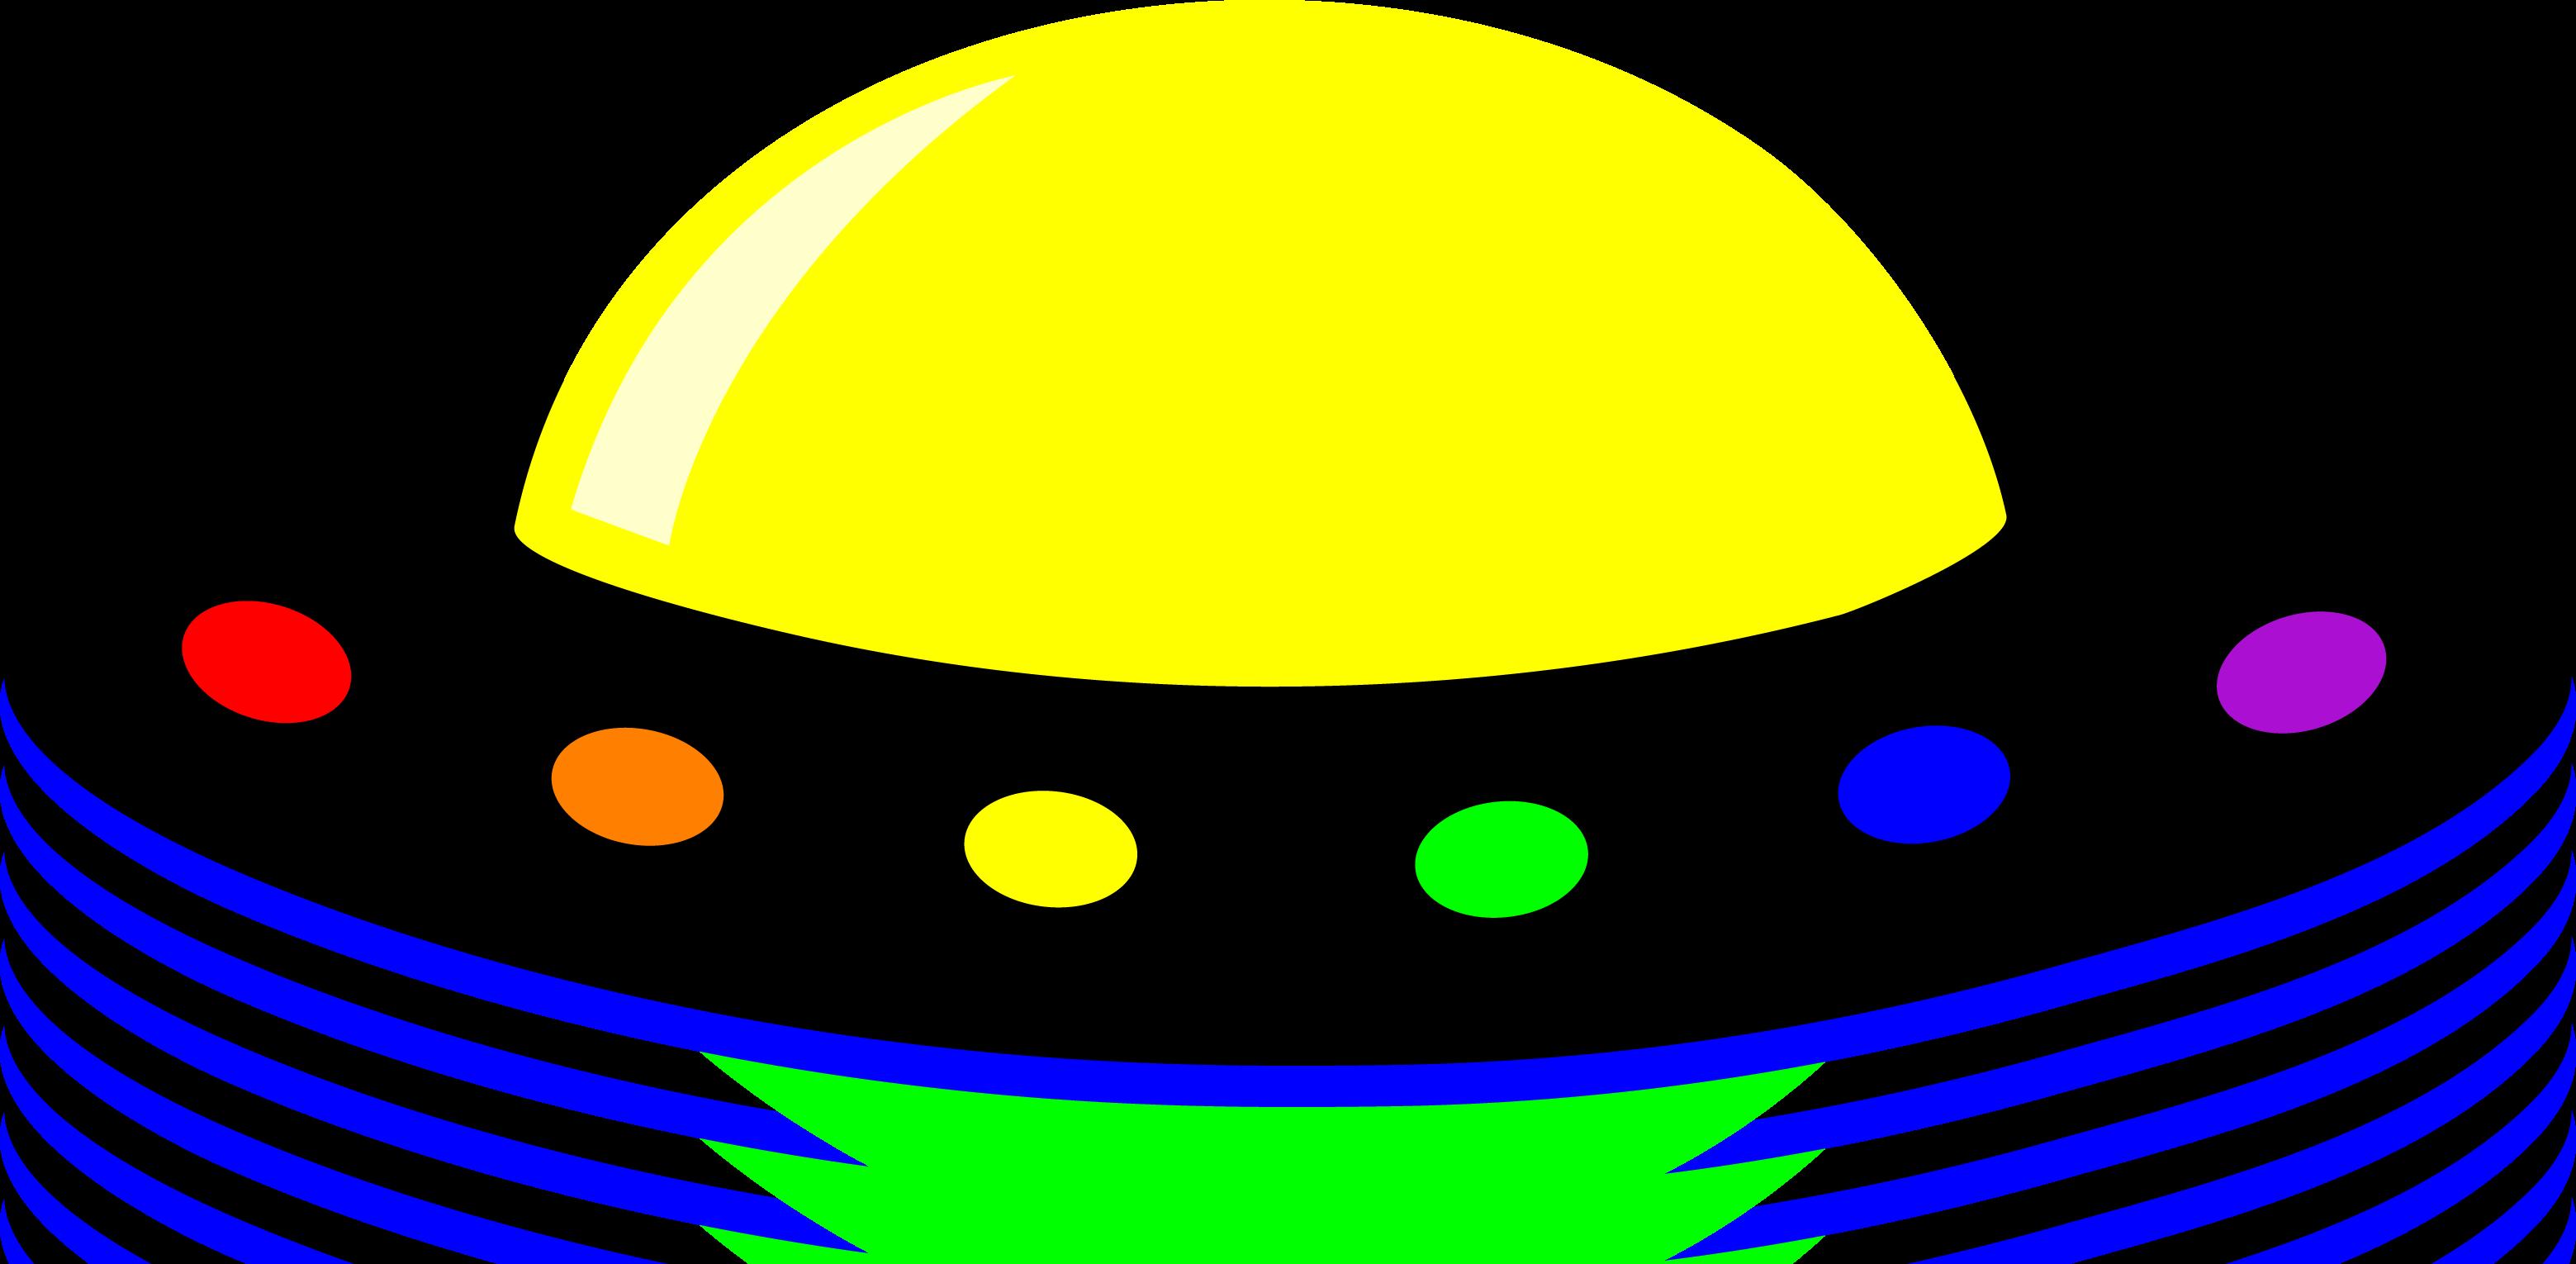 alien spacecraft clipart - HD3119×1530